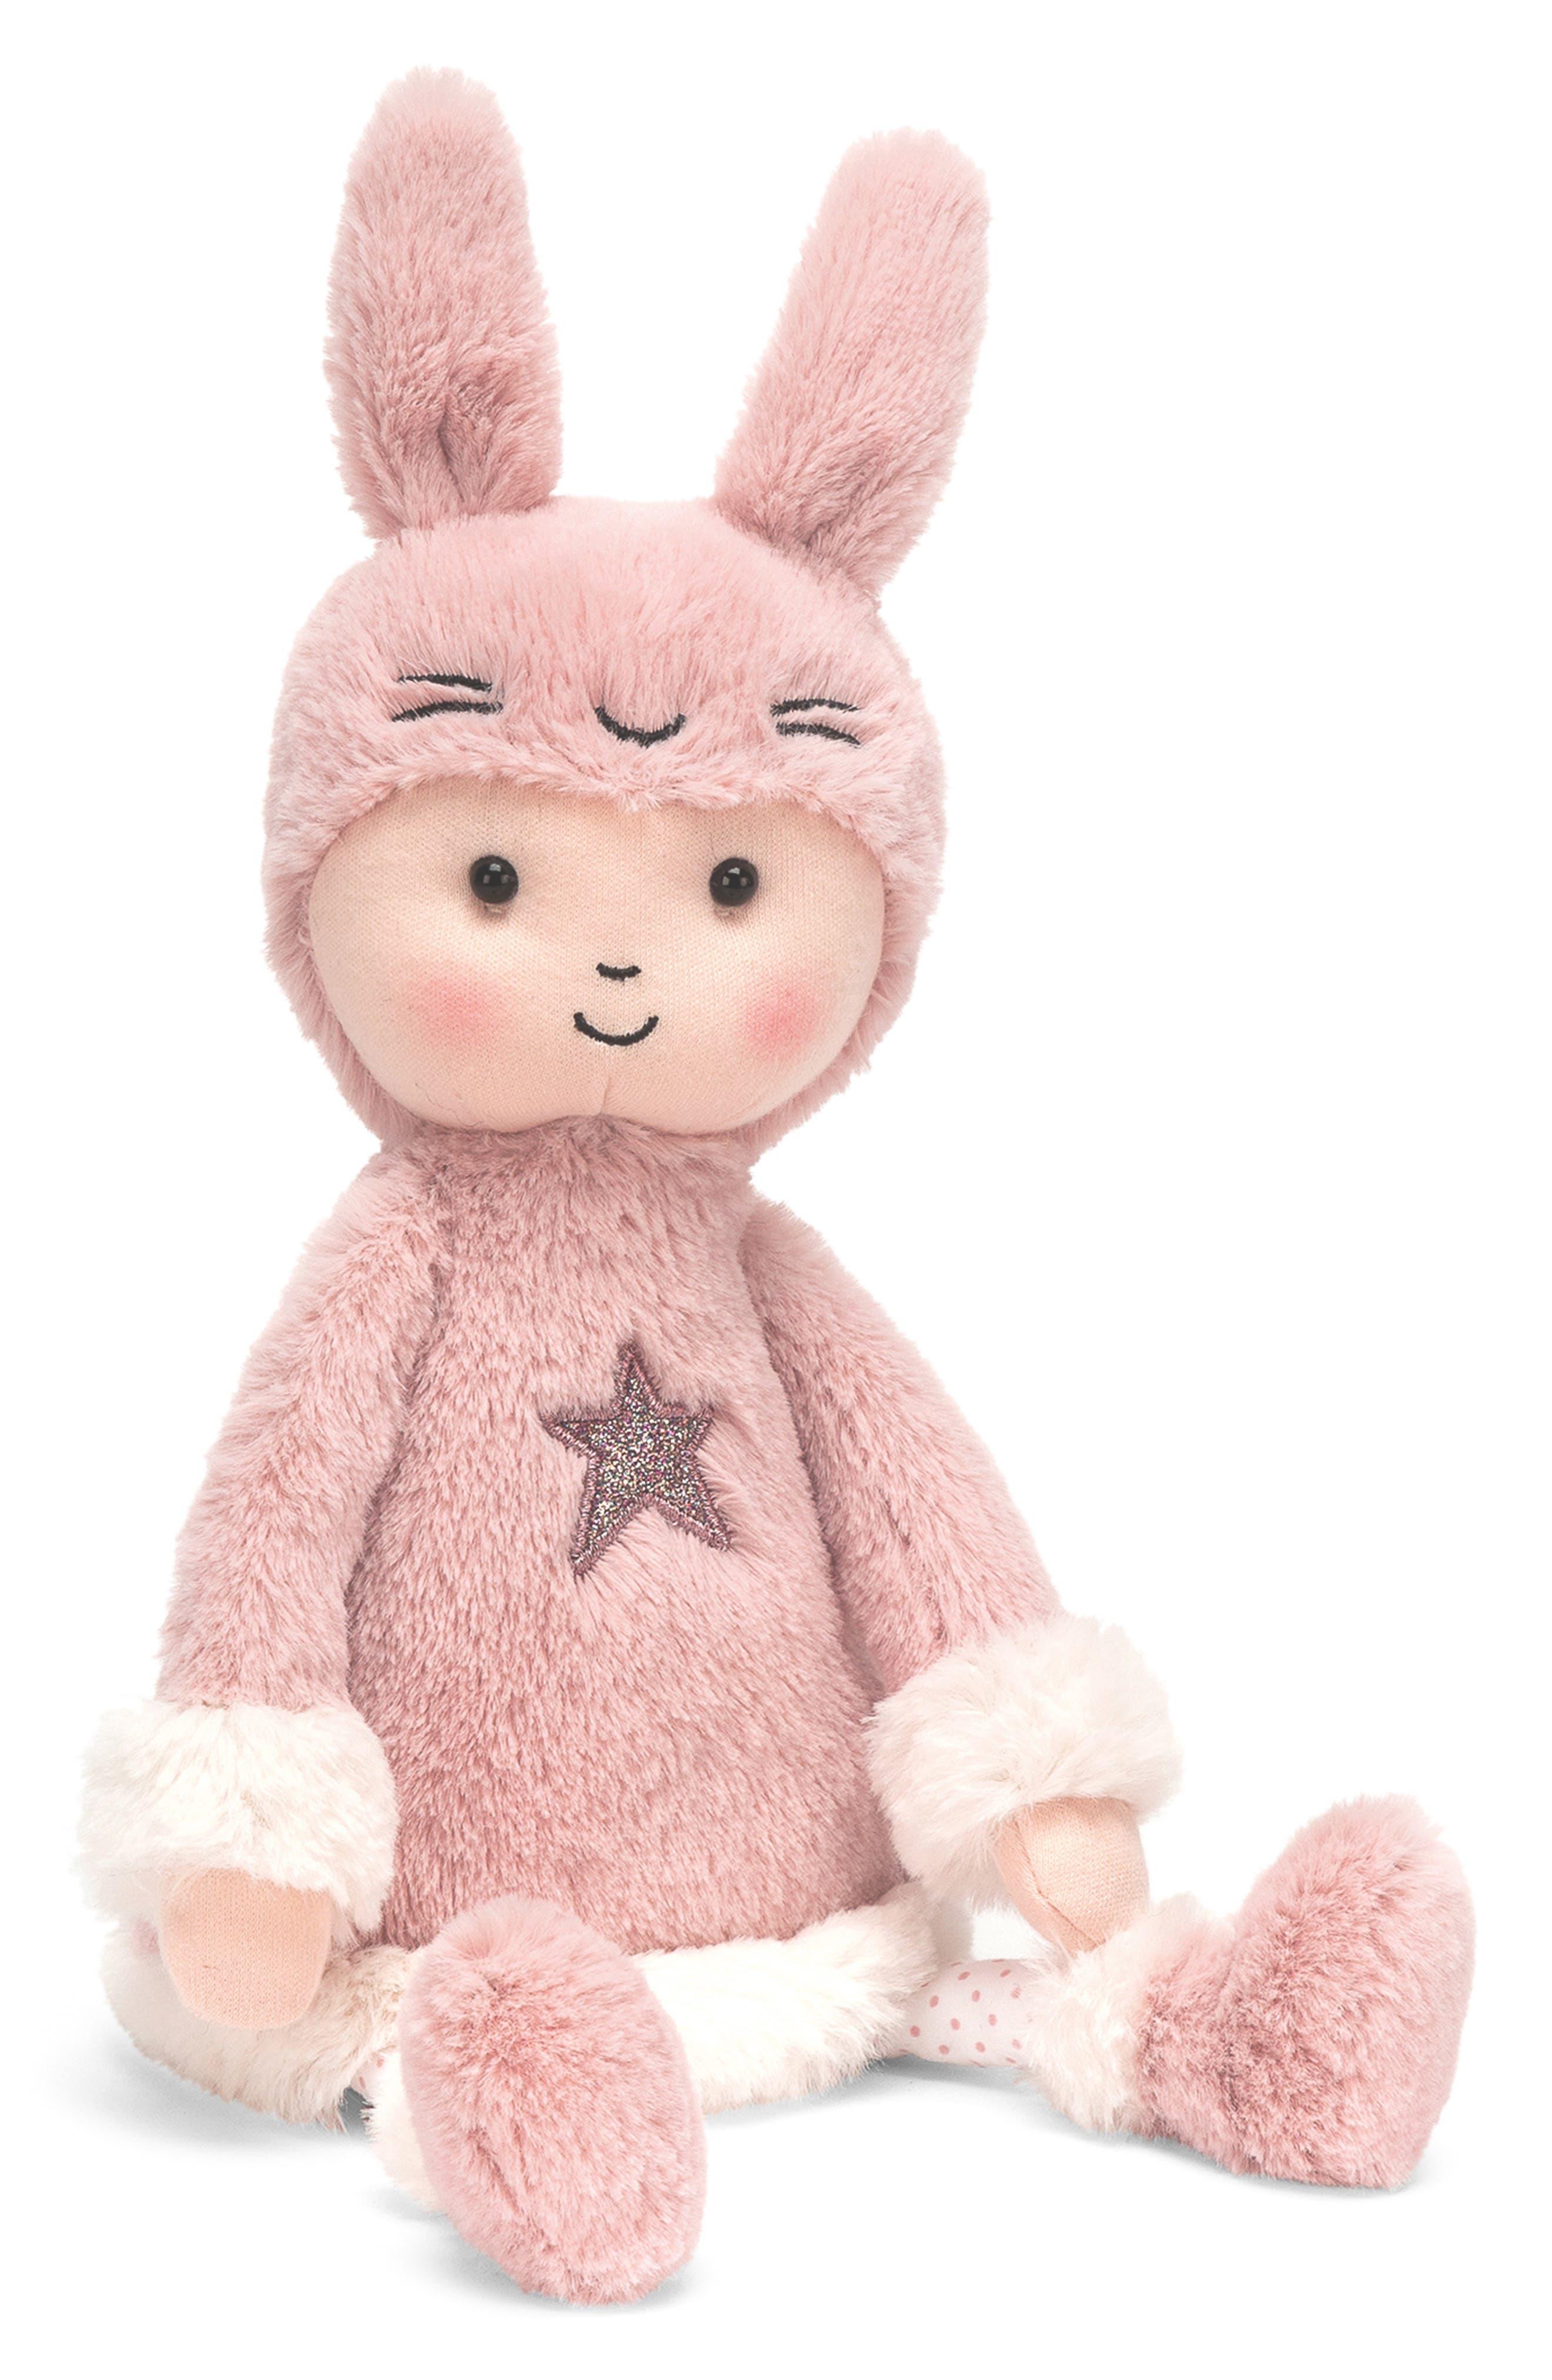 Toddler Jellycat Perkies Bunny Stuffed Doll